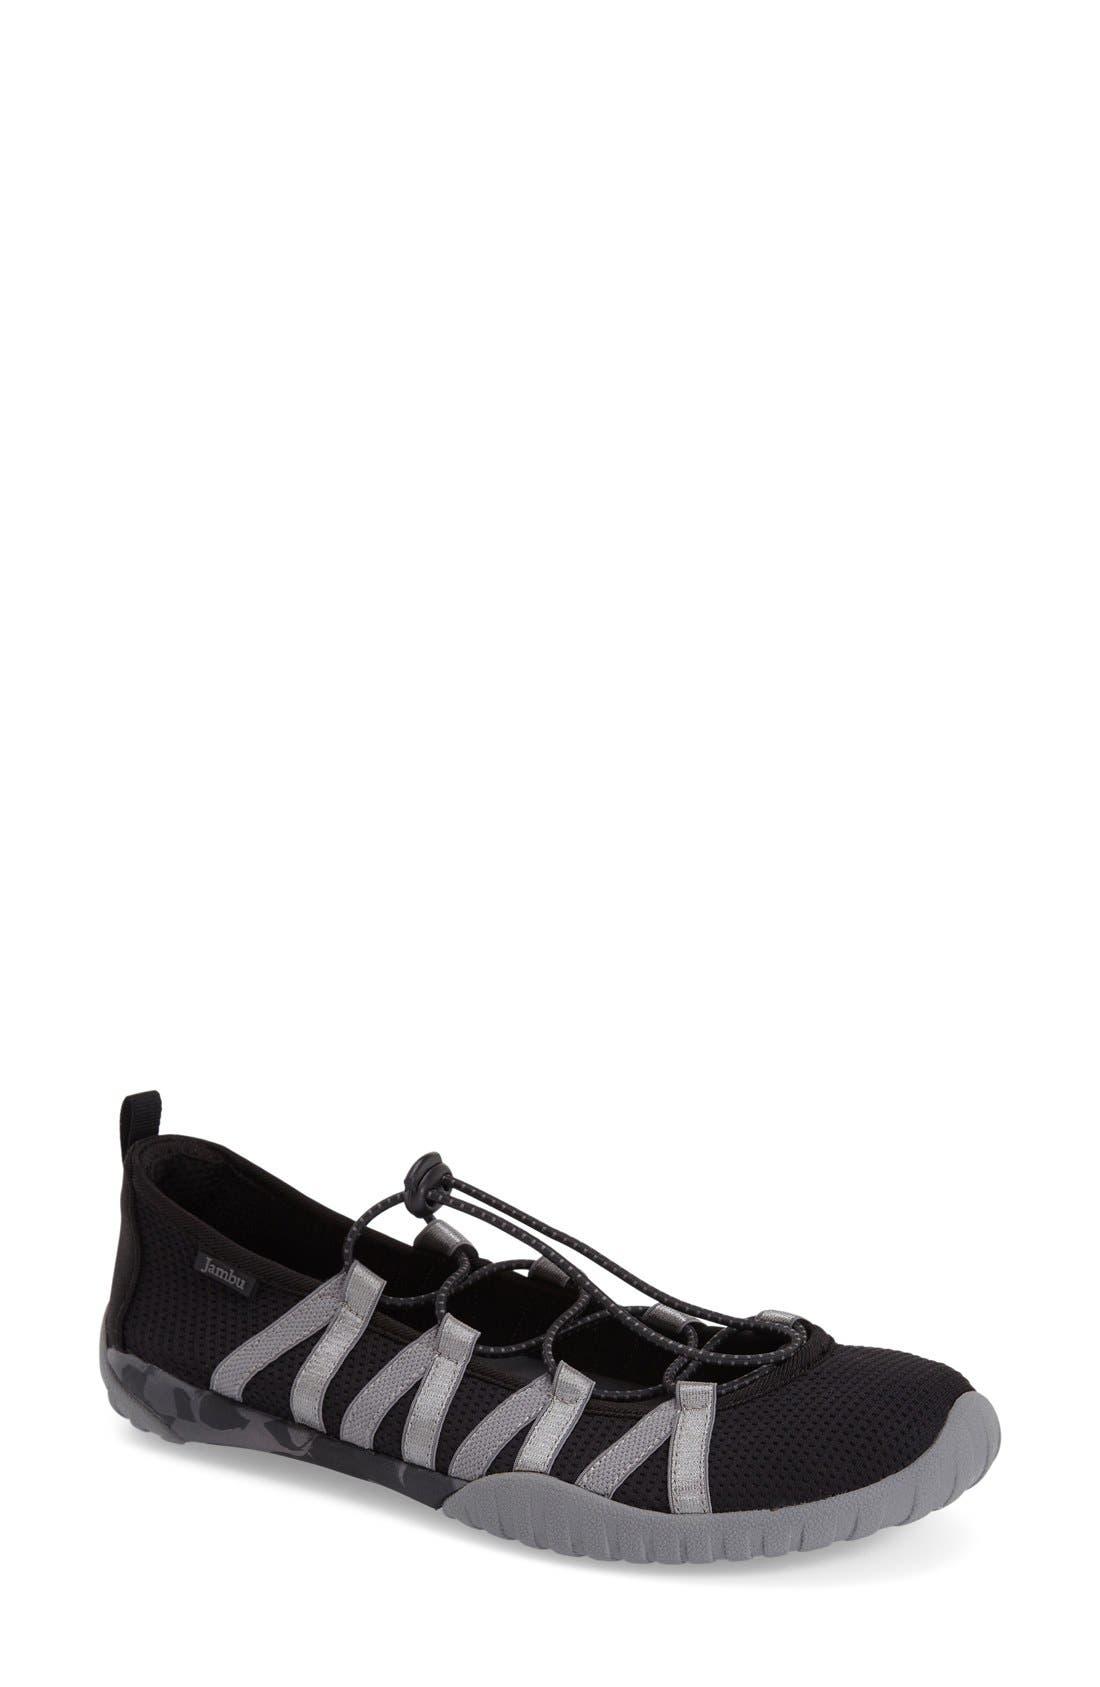 'Manuka' Water Friendly Slip-On Sneaker,                             Main thumbnail 1, color,